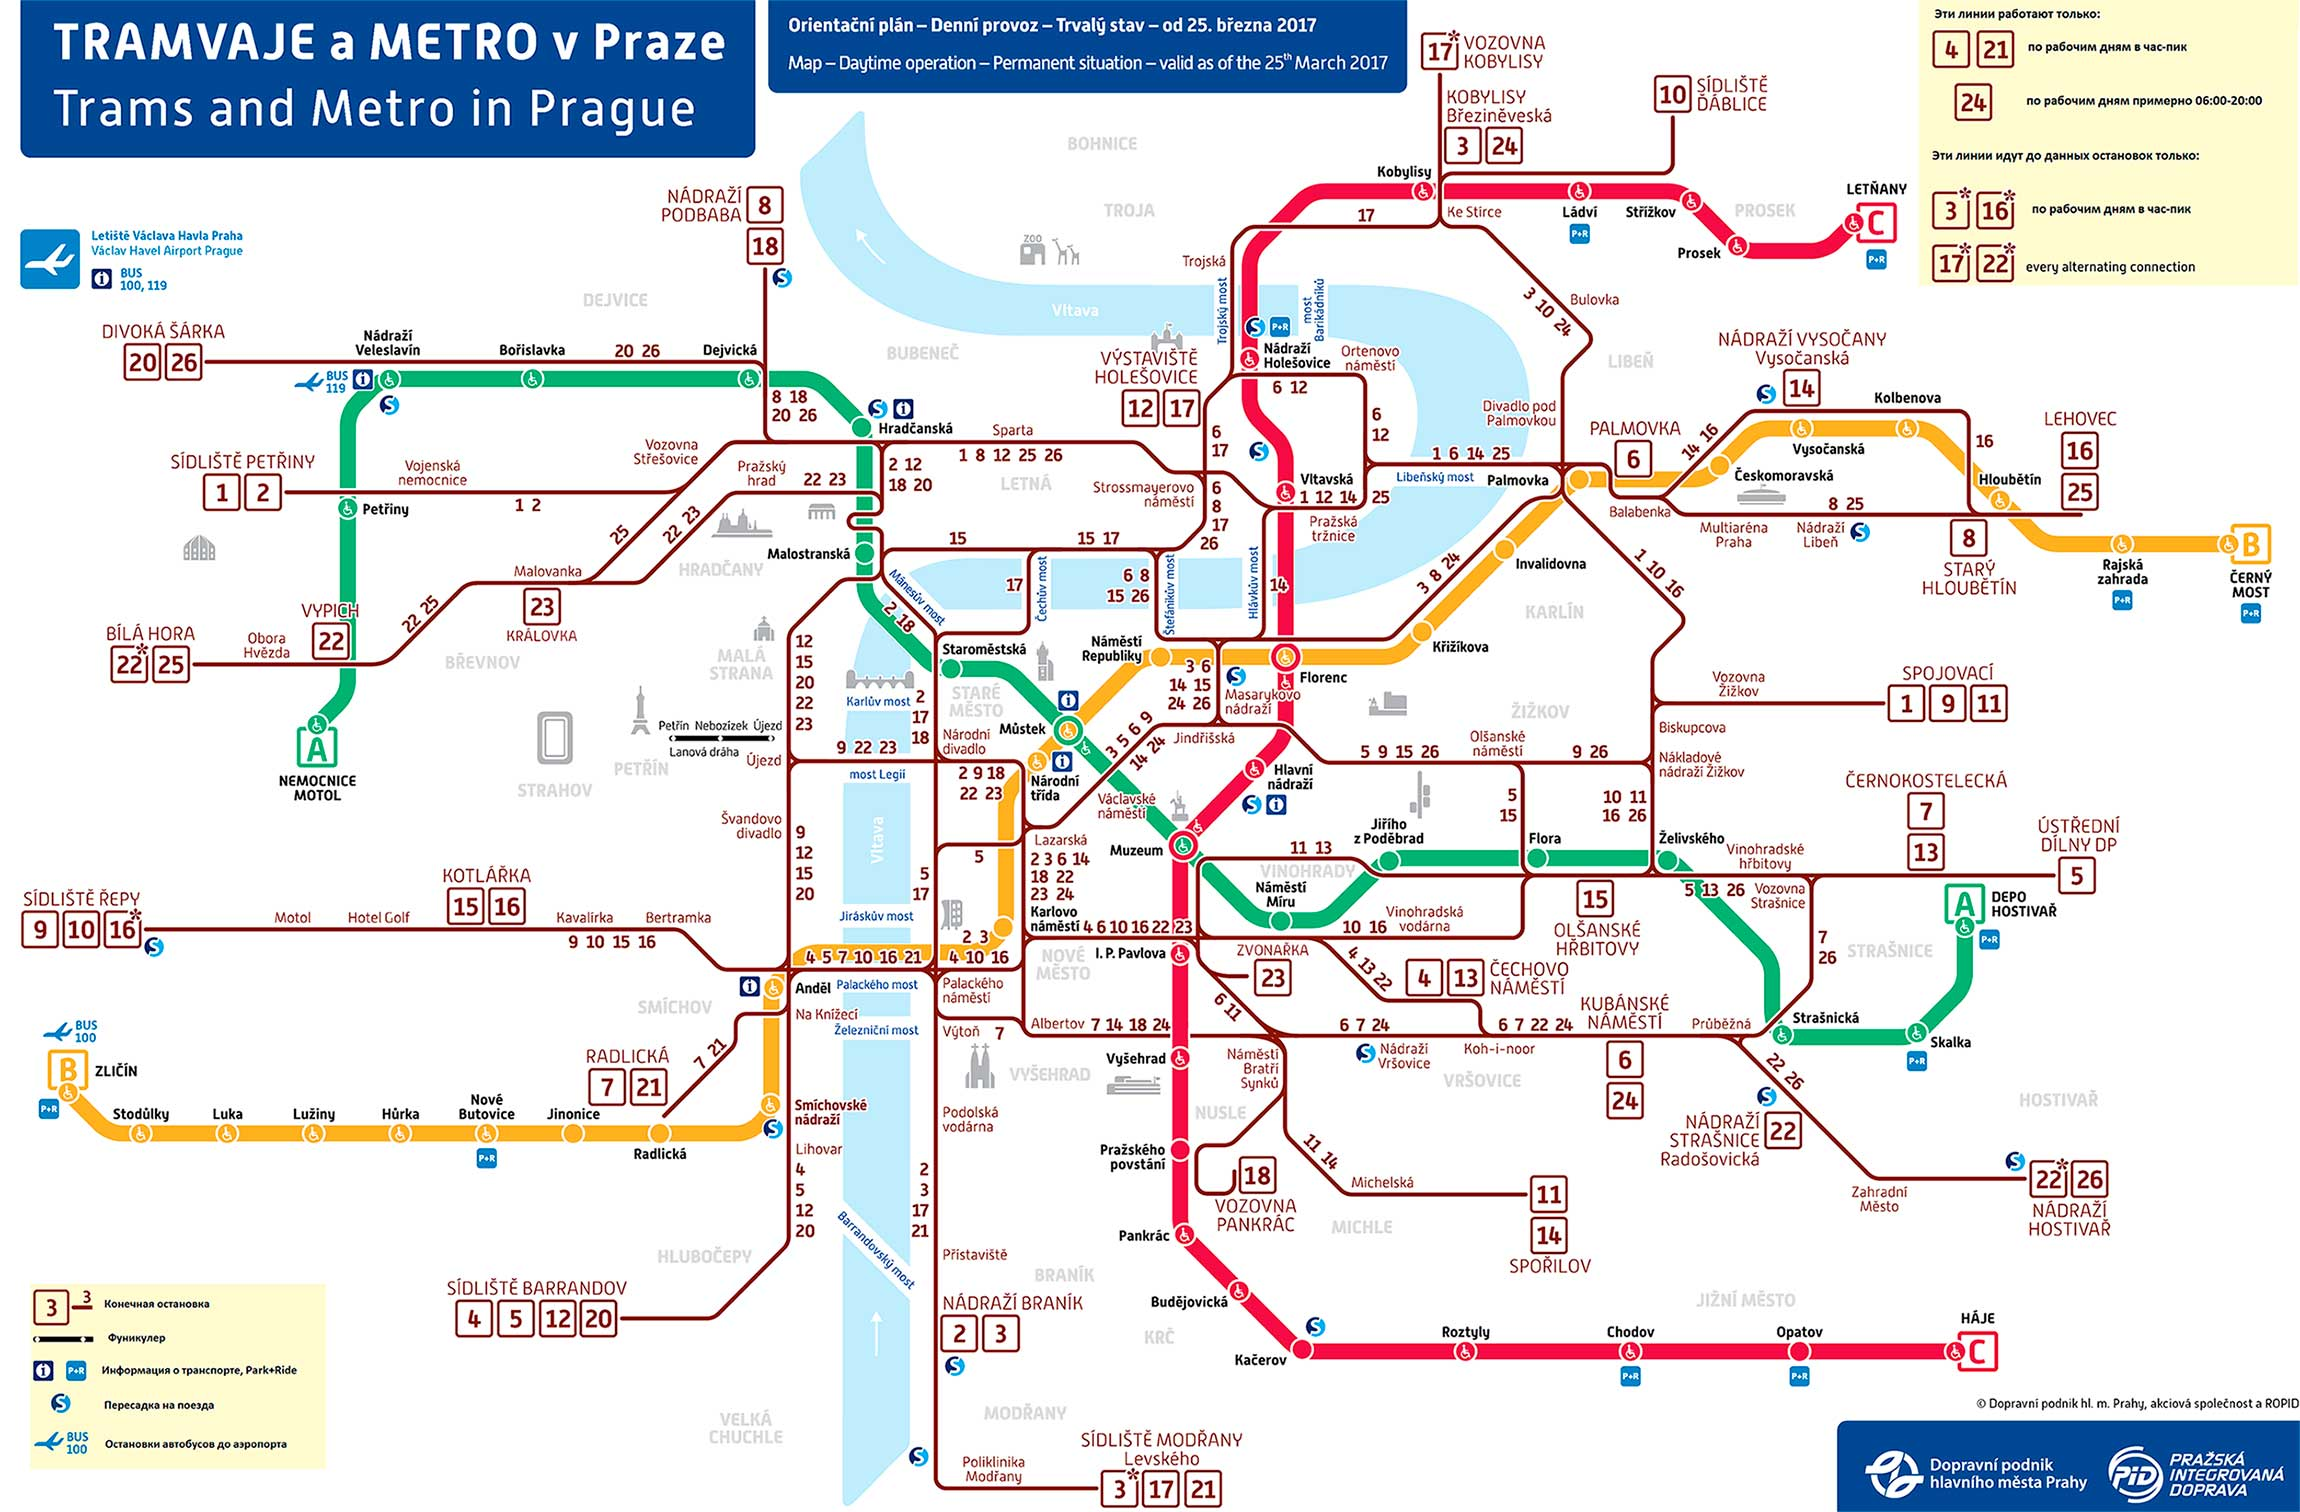 Схема трамвайных маршрутов в Праге